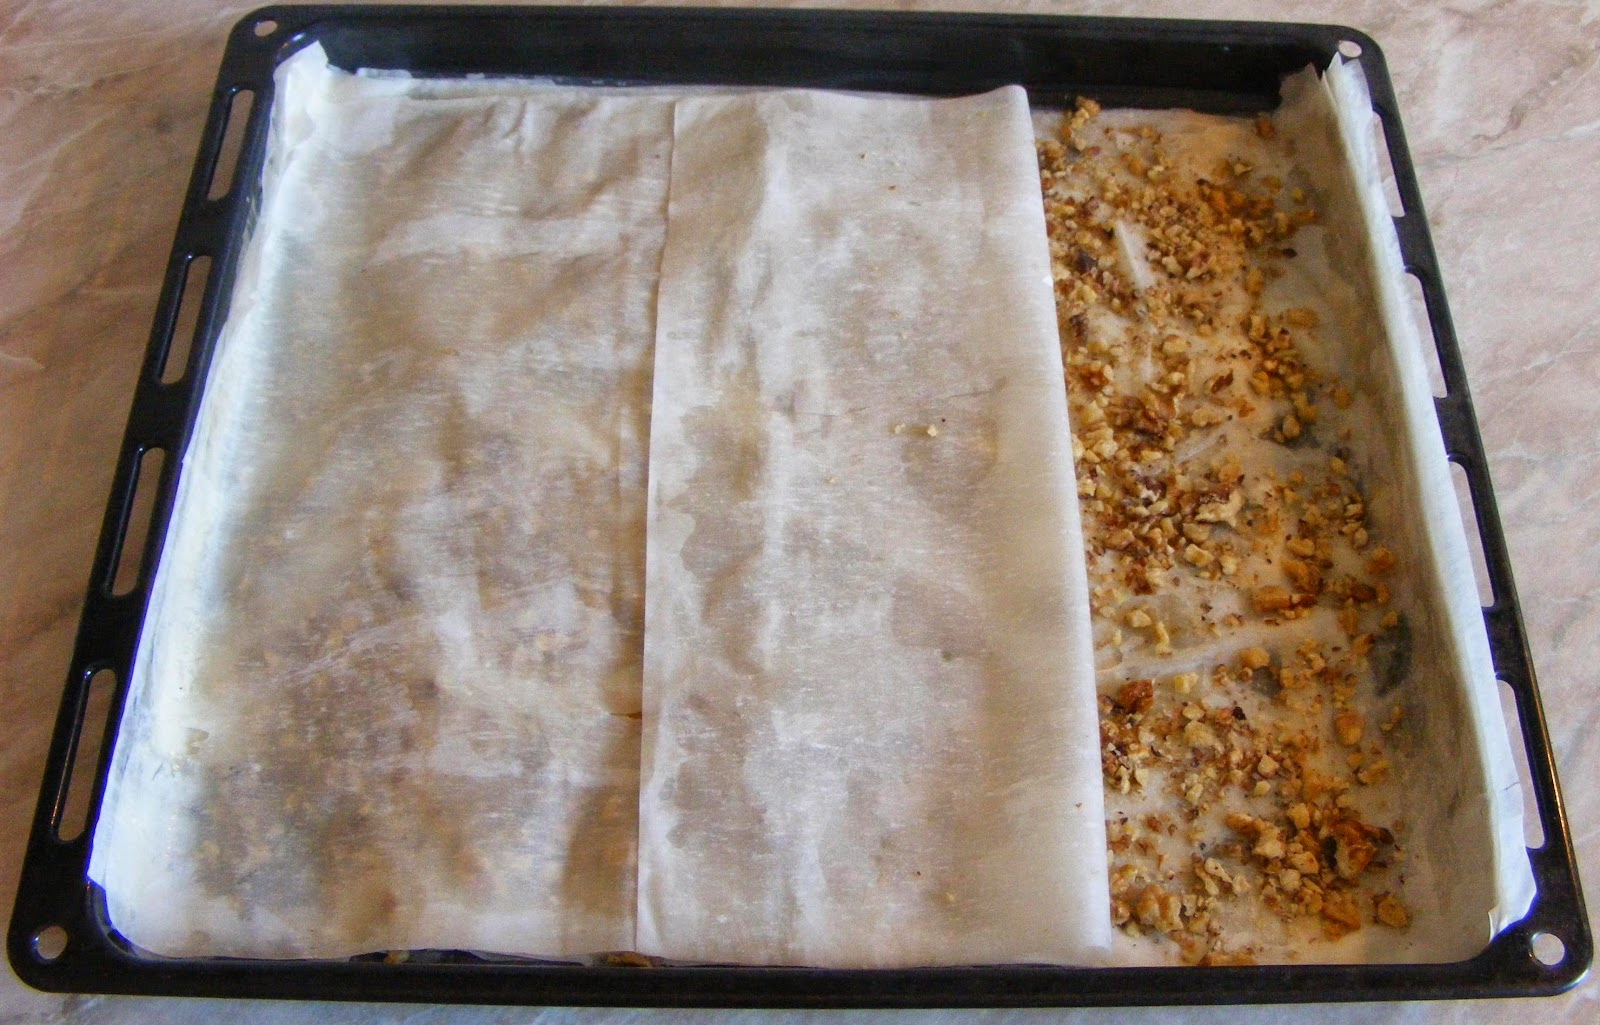 preparare baclavale, cum se prepara baclavale, cum facem baclava, cum se prepara baclava cu foi de placinta si nuca, retete si preparate culinare baclava,